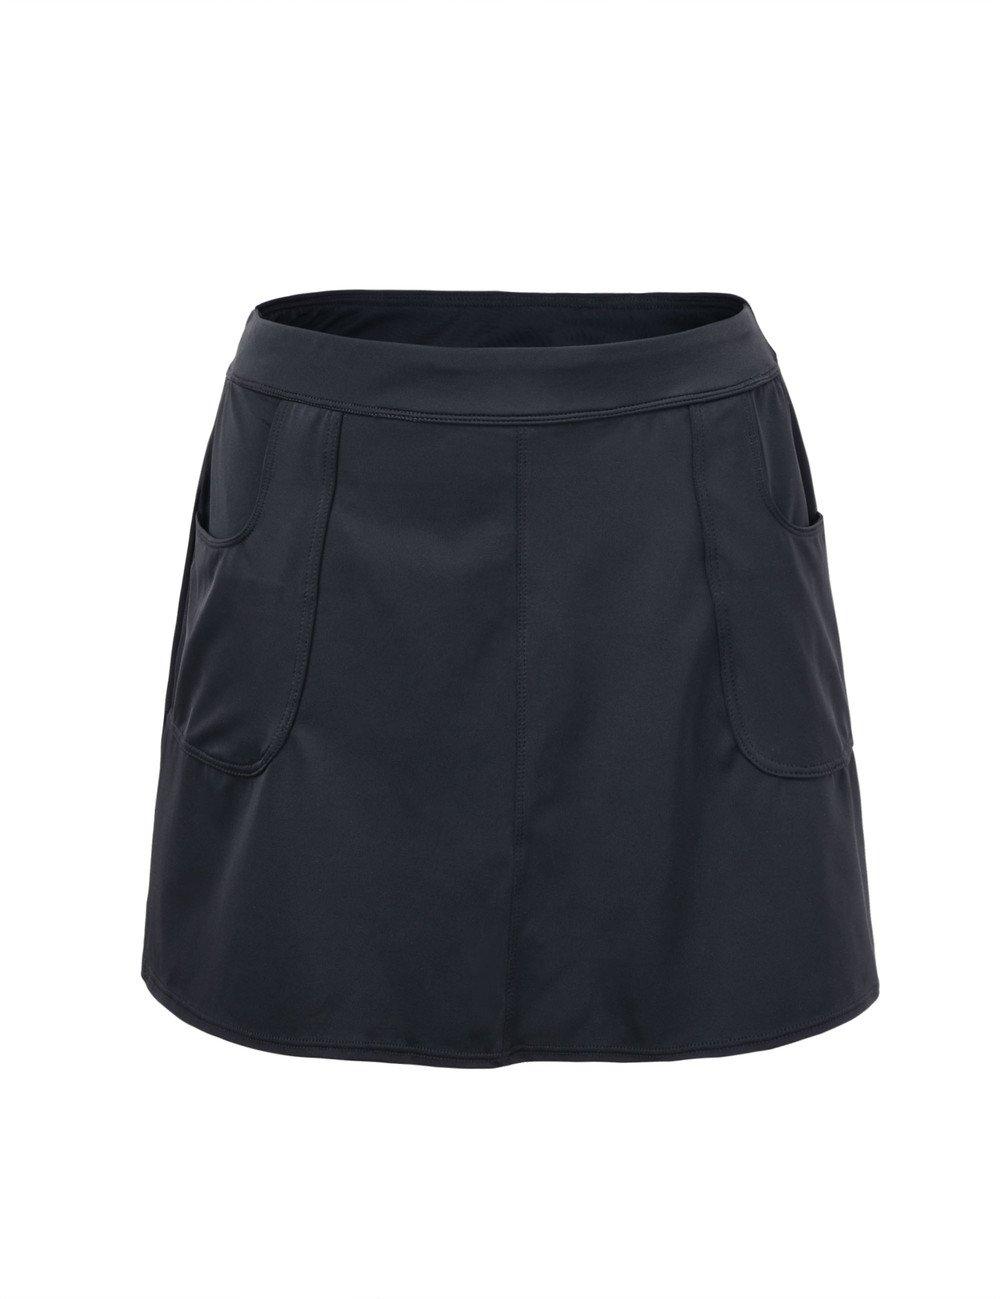 HilorレディースUPF 50 + Athletic Skirted Bikini Bottom Swim Bottom Skort Tankinis Swimdress B01N99HTE4 ブラック 10